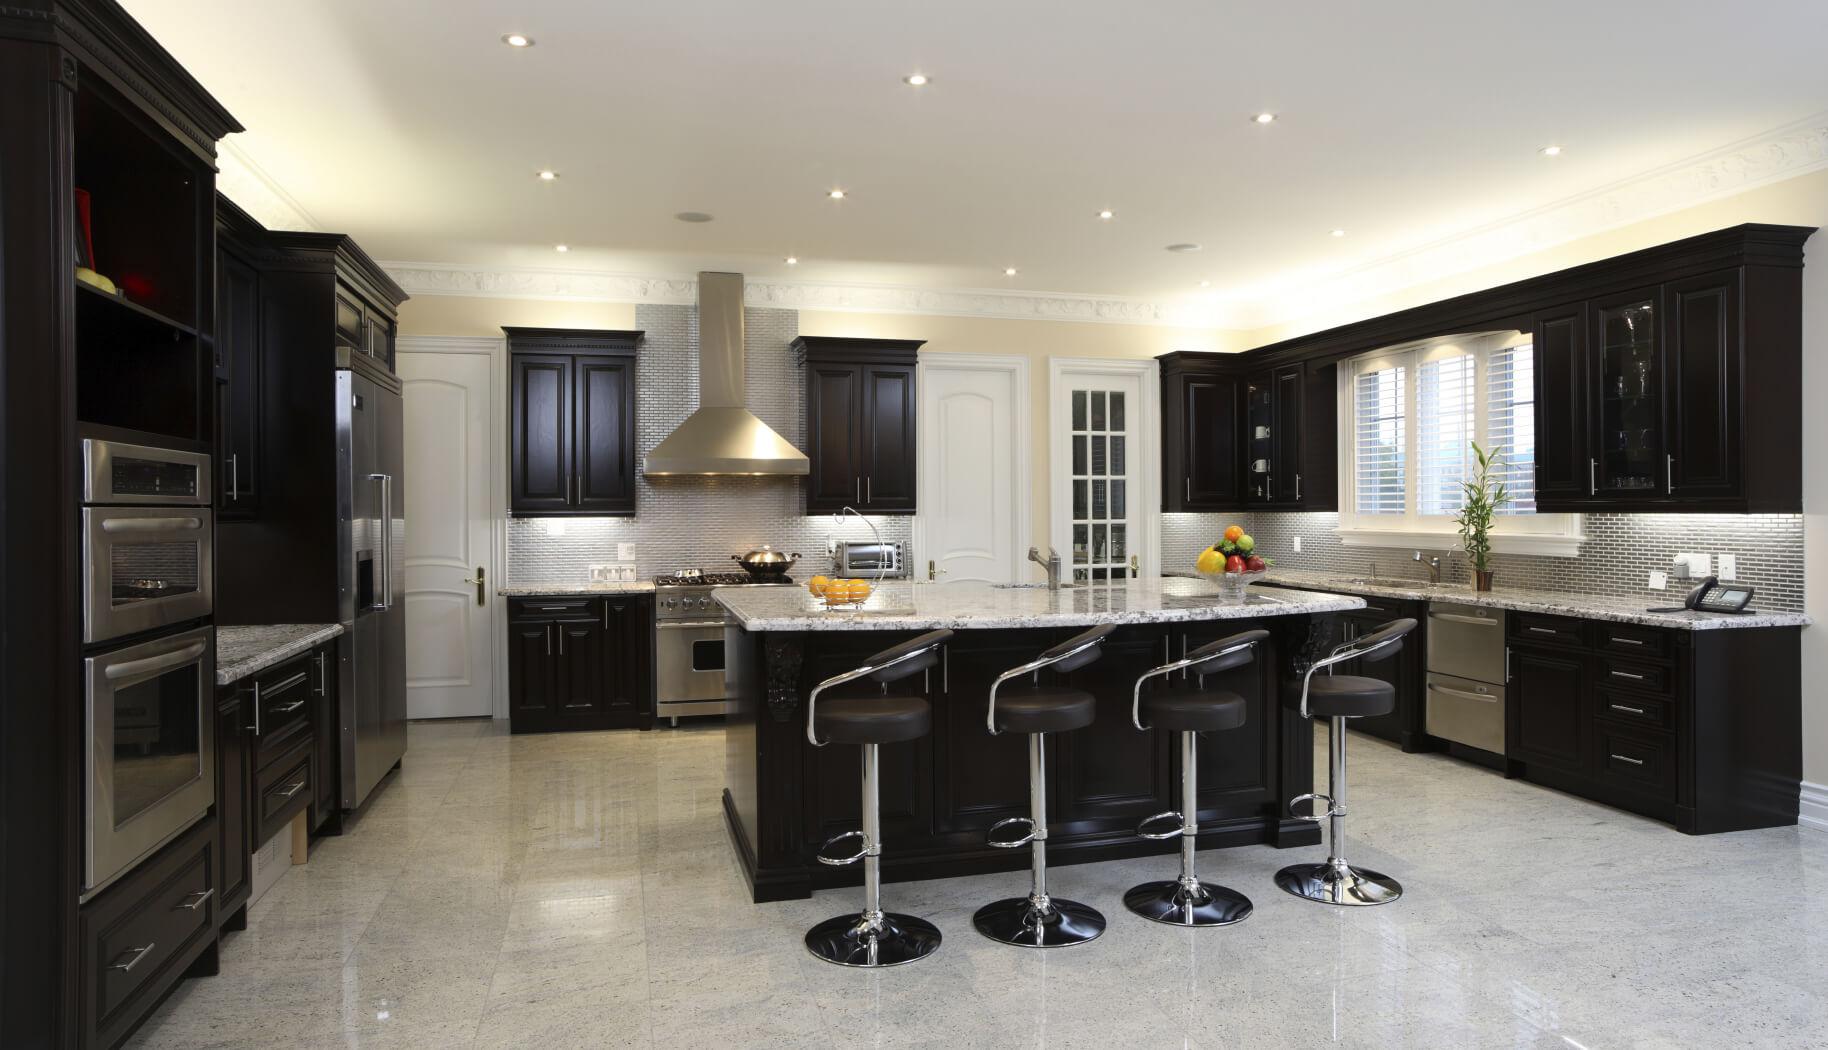 Splendiferous Breakfast Dinerstyle Stools 72 Black Cabinets Kitchen G Hardware Spacious Kitchen Kitchens Wood Or Black Kitchen Cabinets Black Cabinet Kitchen 18 Wide kitchen Black Cabinet Kitchens